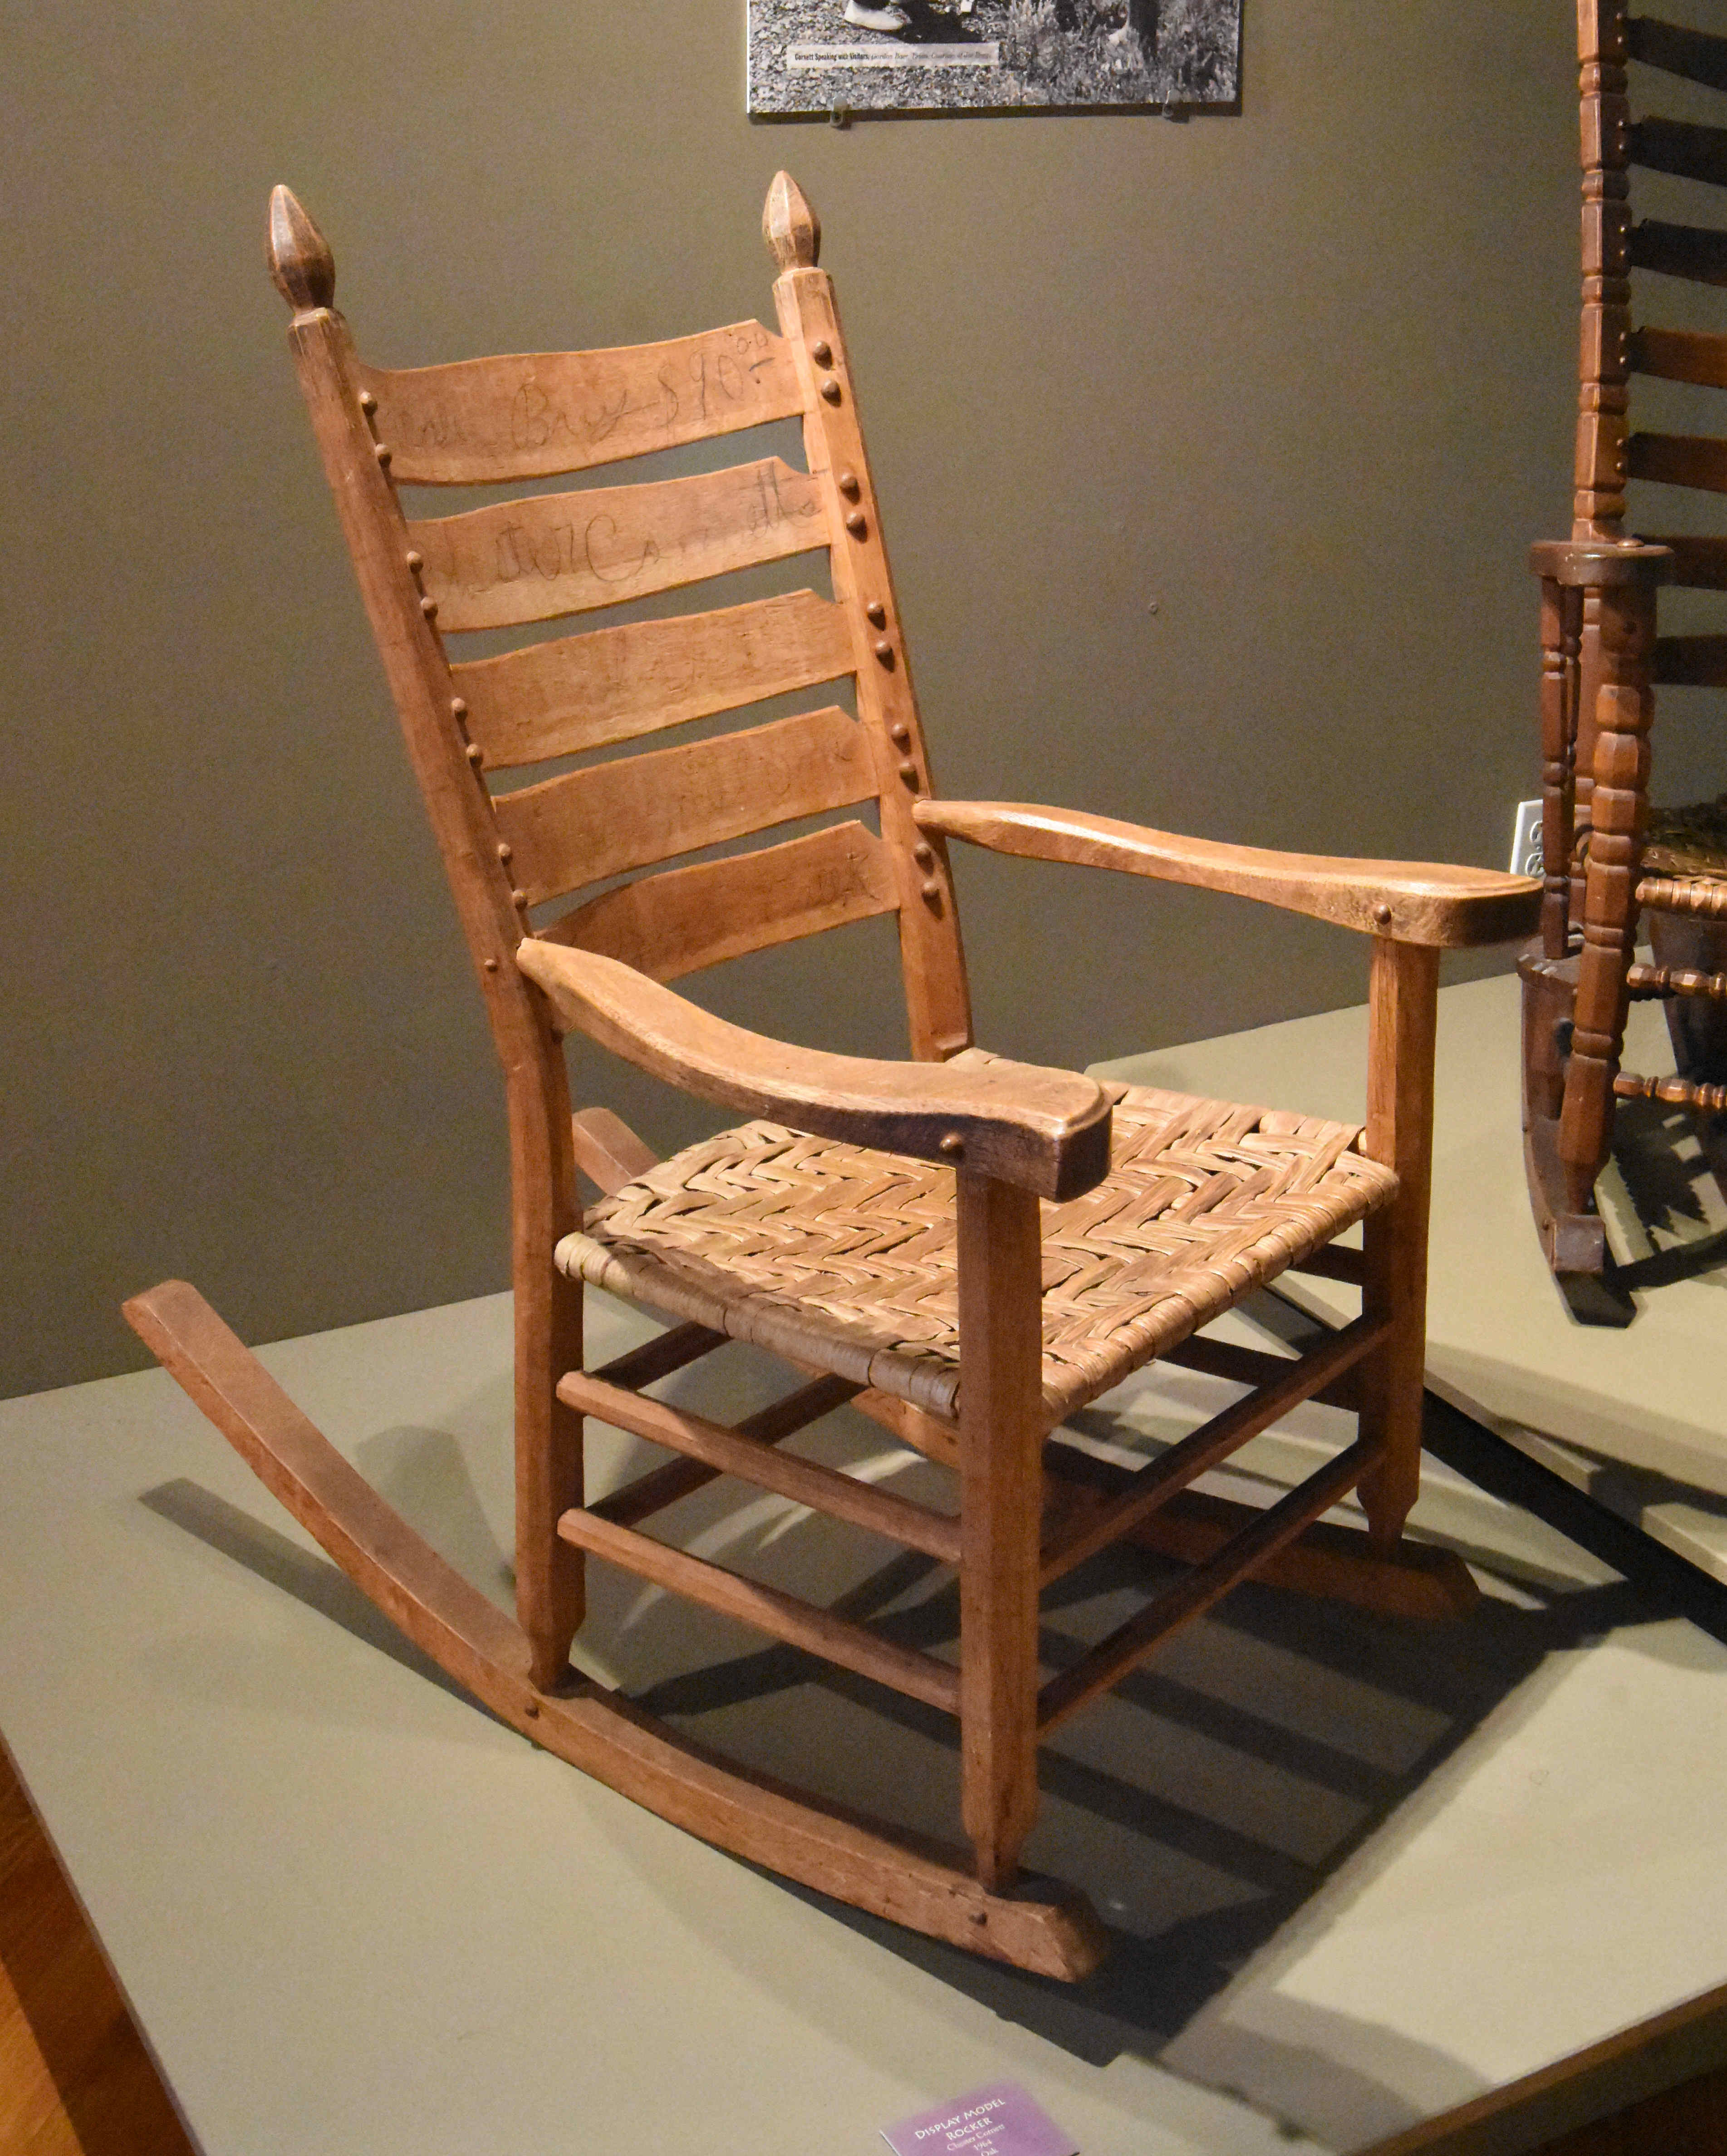 Swell Chester Cornett Chairs Peter Follansbee Joiners Notes Beatyapartments Chair Design Images Beatyapartmentscom